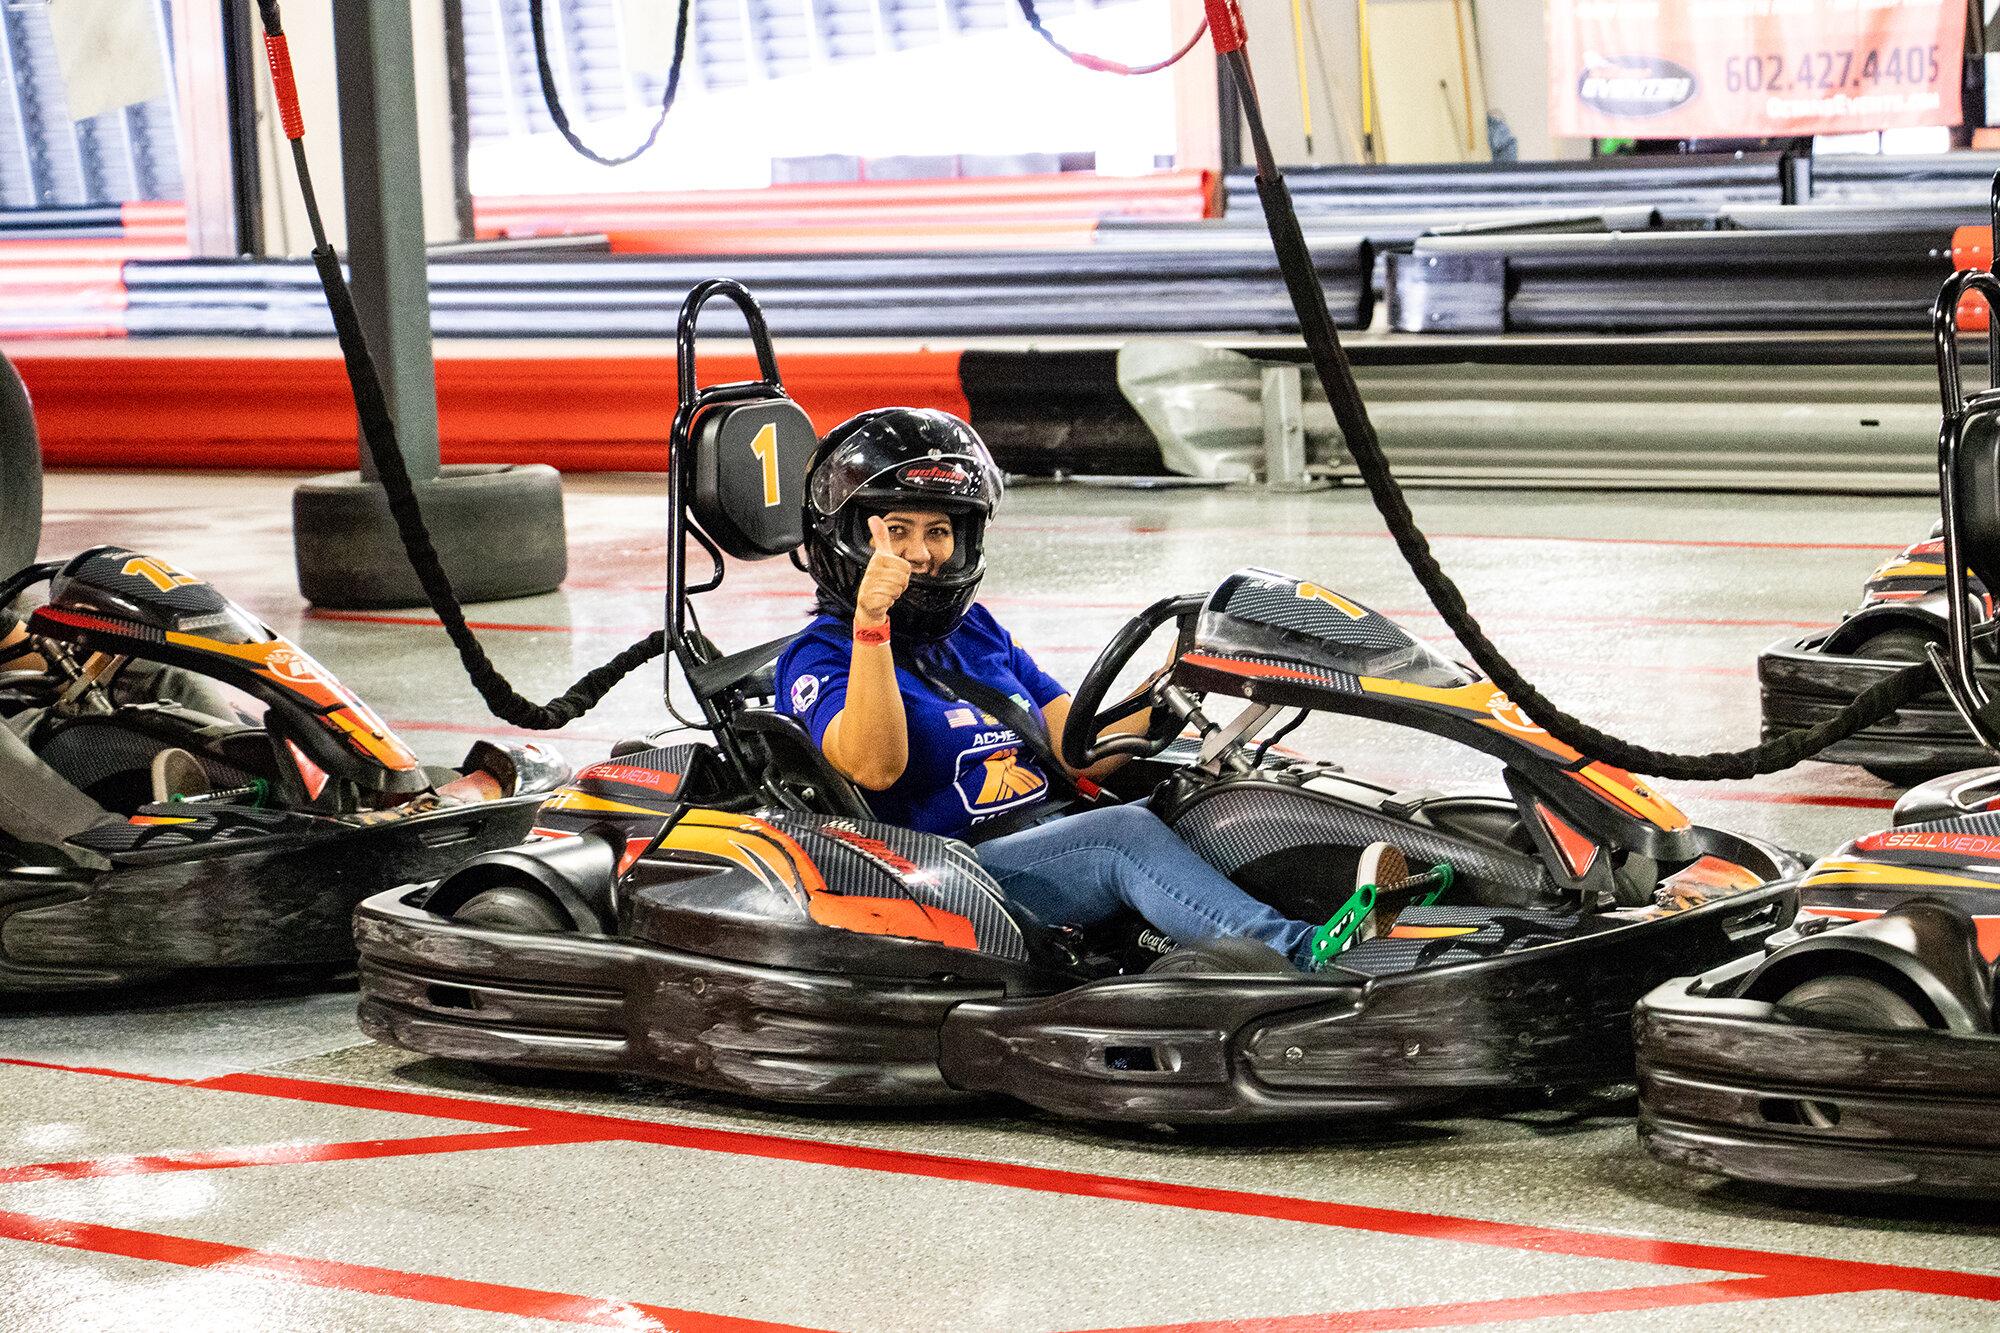 2019 AZ AGC Octane Racing - 3-small.jpg